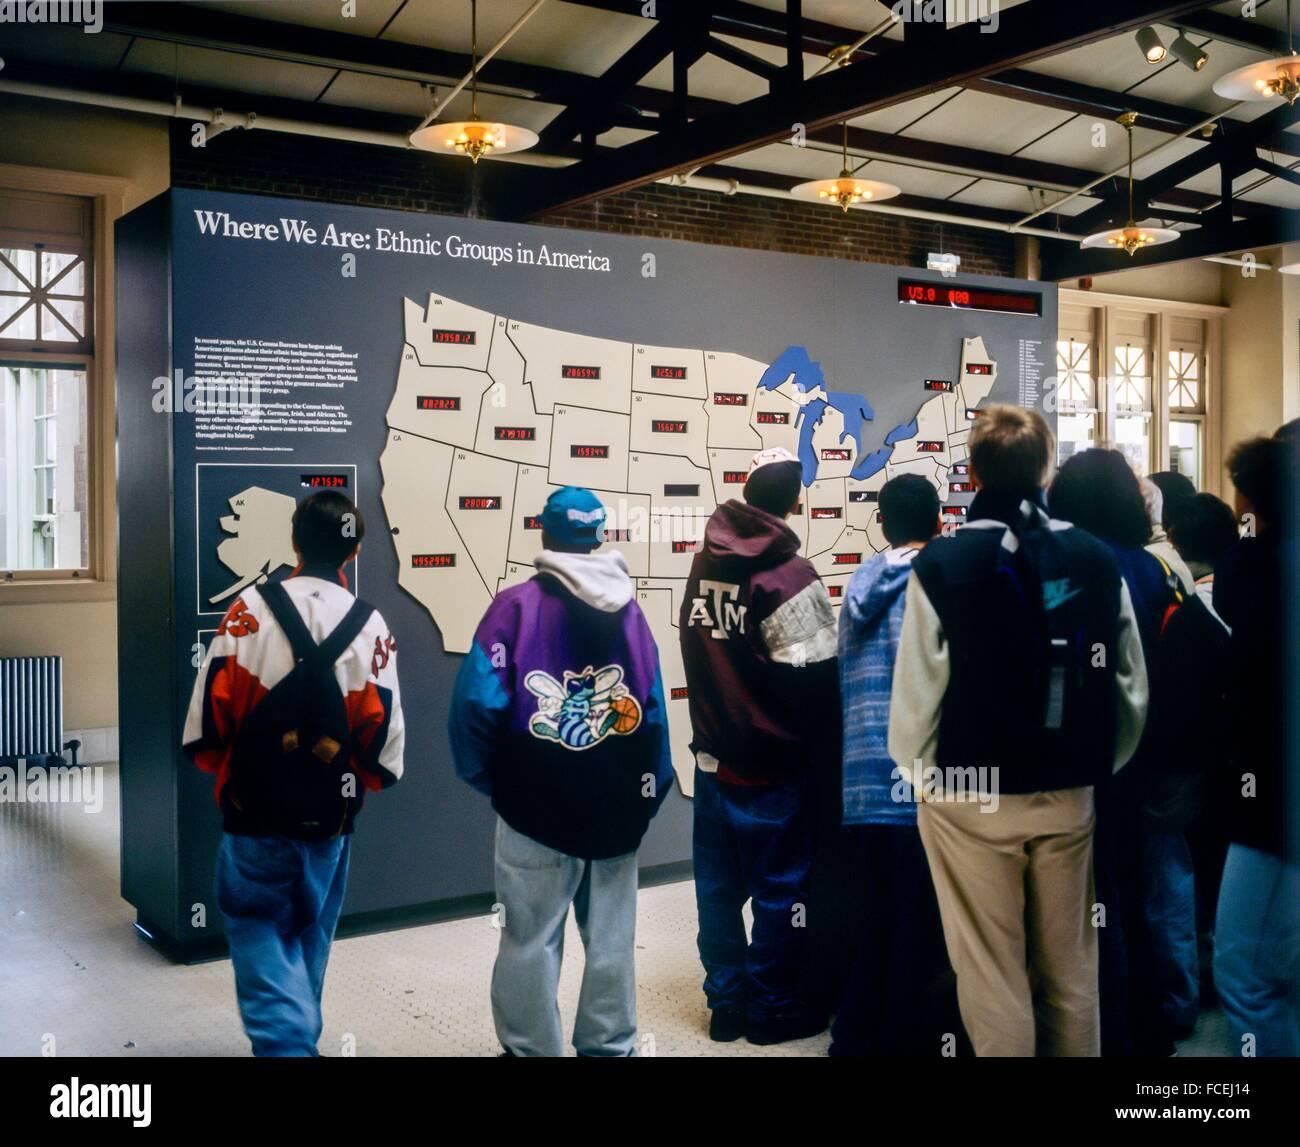 Students By US Ethnic Groups Map Ellis Island Museum New York NY - Map of new york ellis island